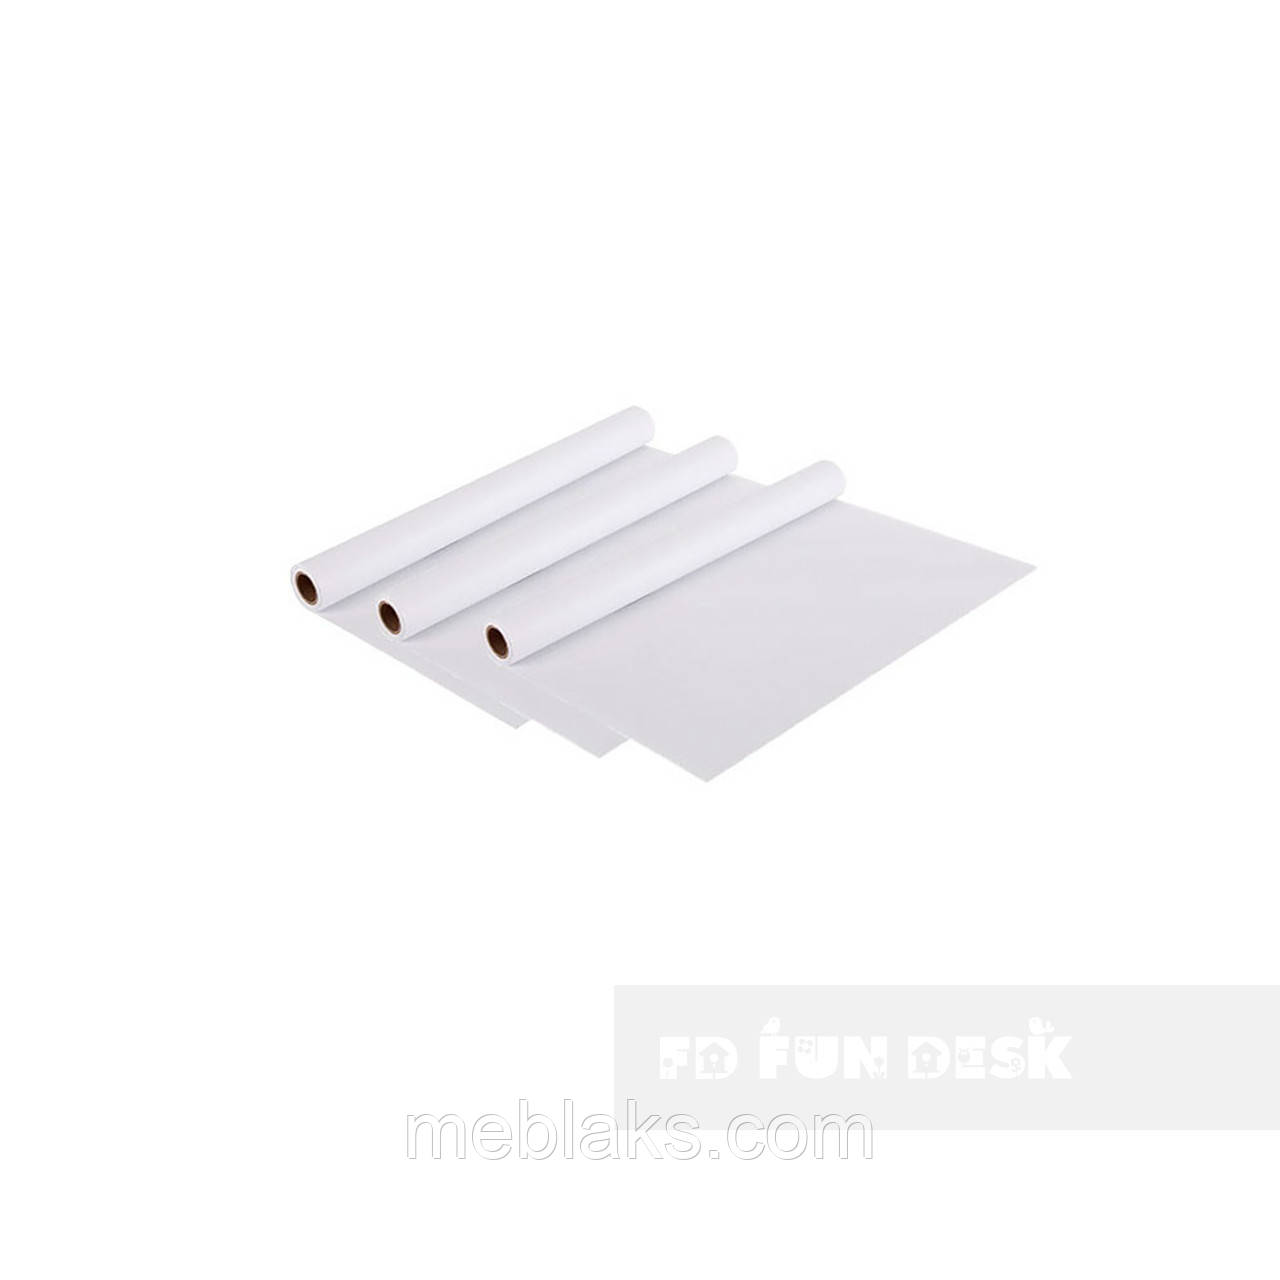 Комплект бумаги для парт Bambino SS18-3 FunDesk